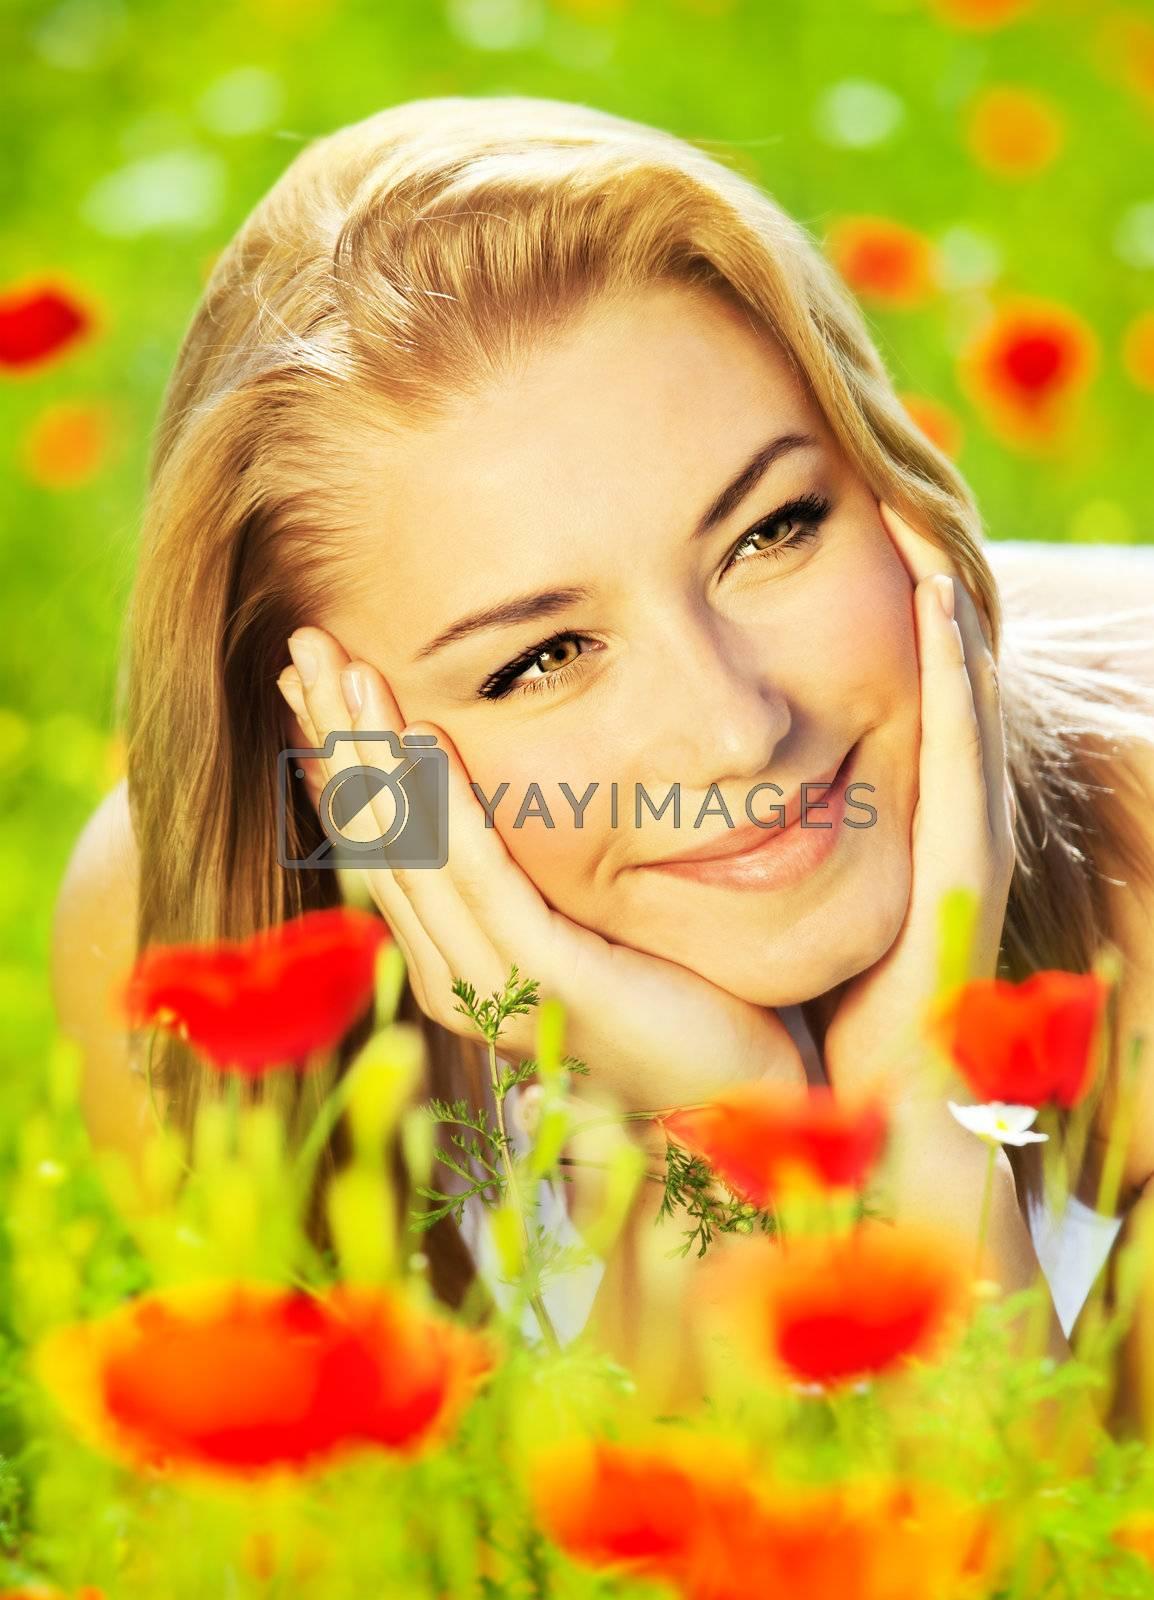 Lovely happy female closeup portrait, lying down in the poppy flower field, enjoying nature, summertime leisure concept